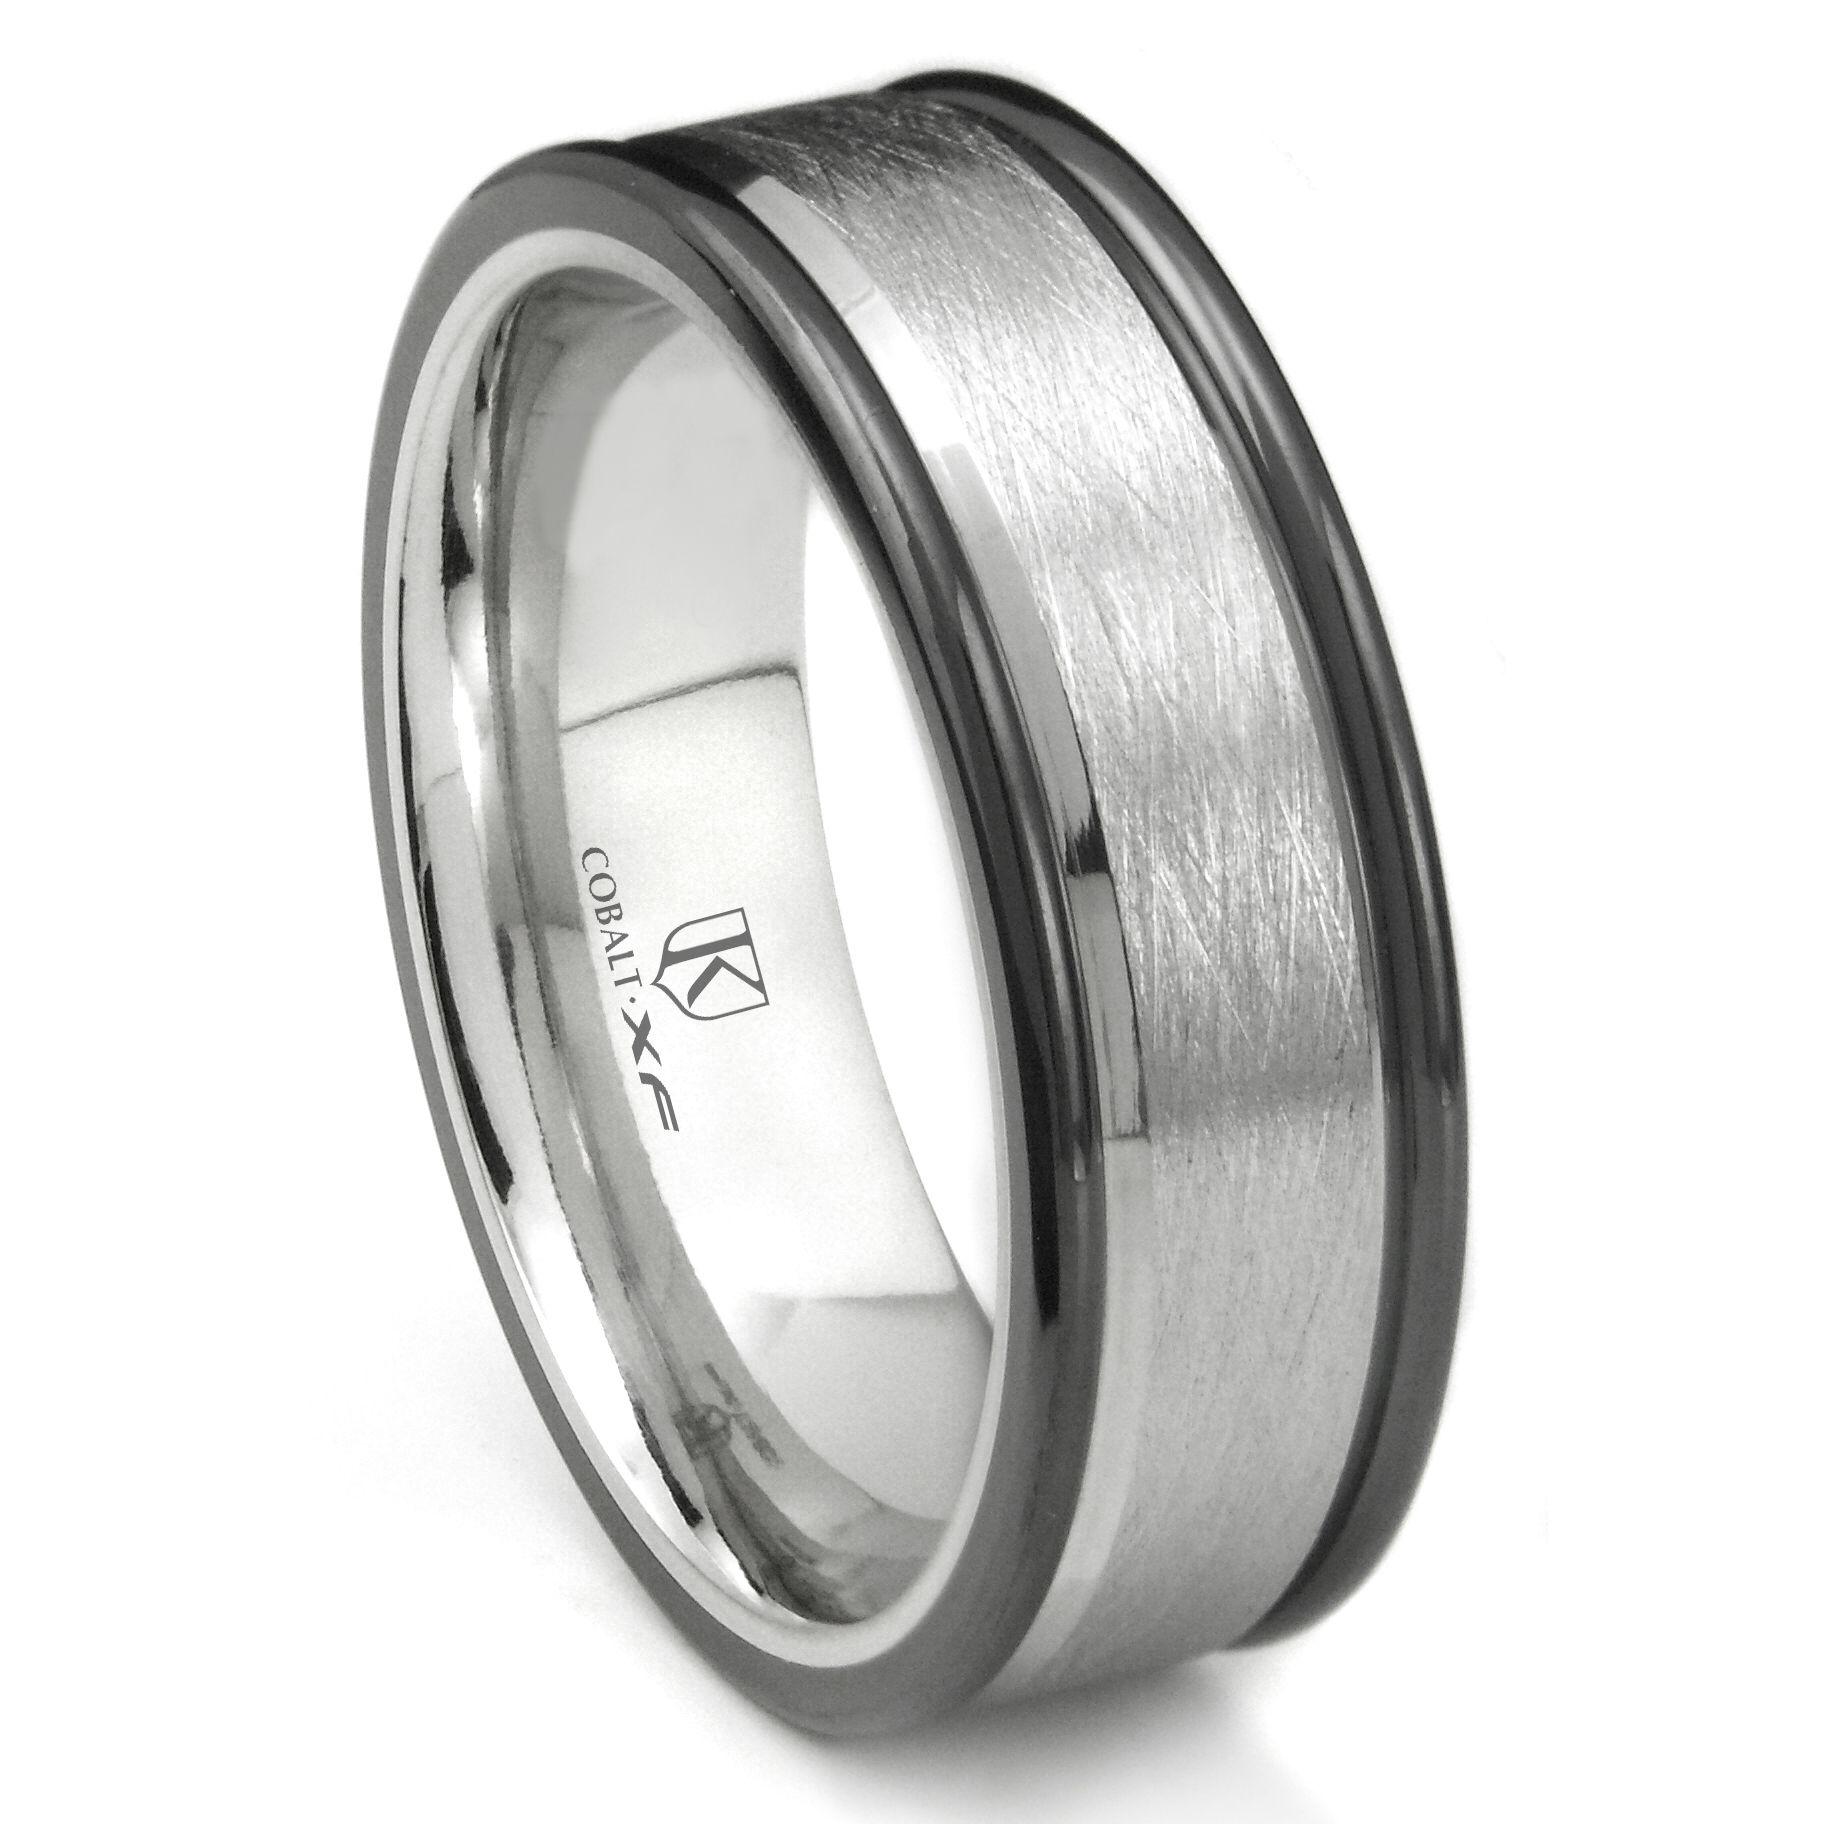 Cobalt XF Chrome 8MM Solitaire Diamond Beveled Wedding Band Ring